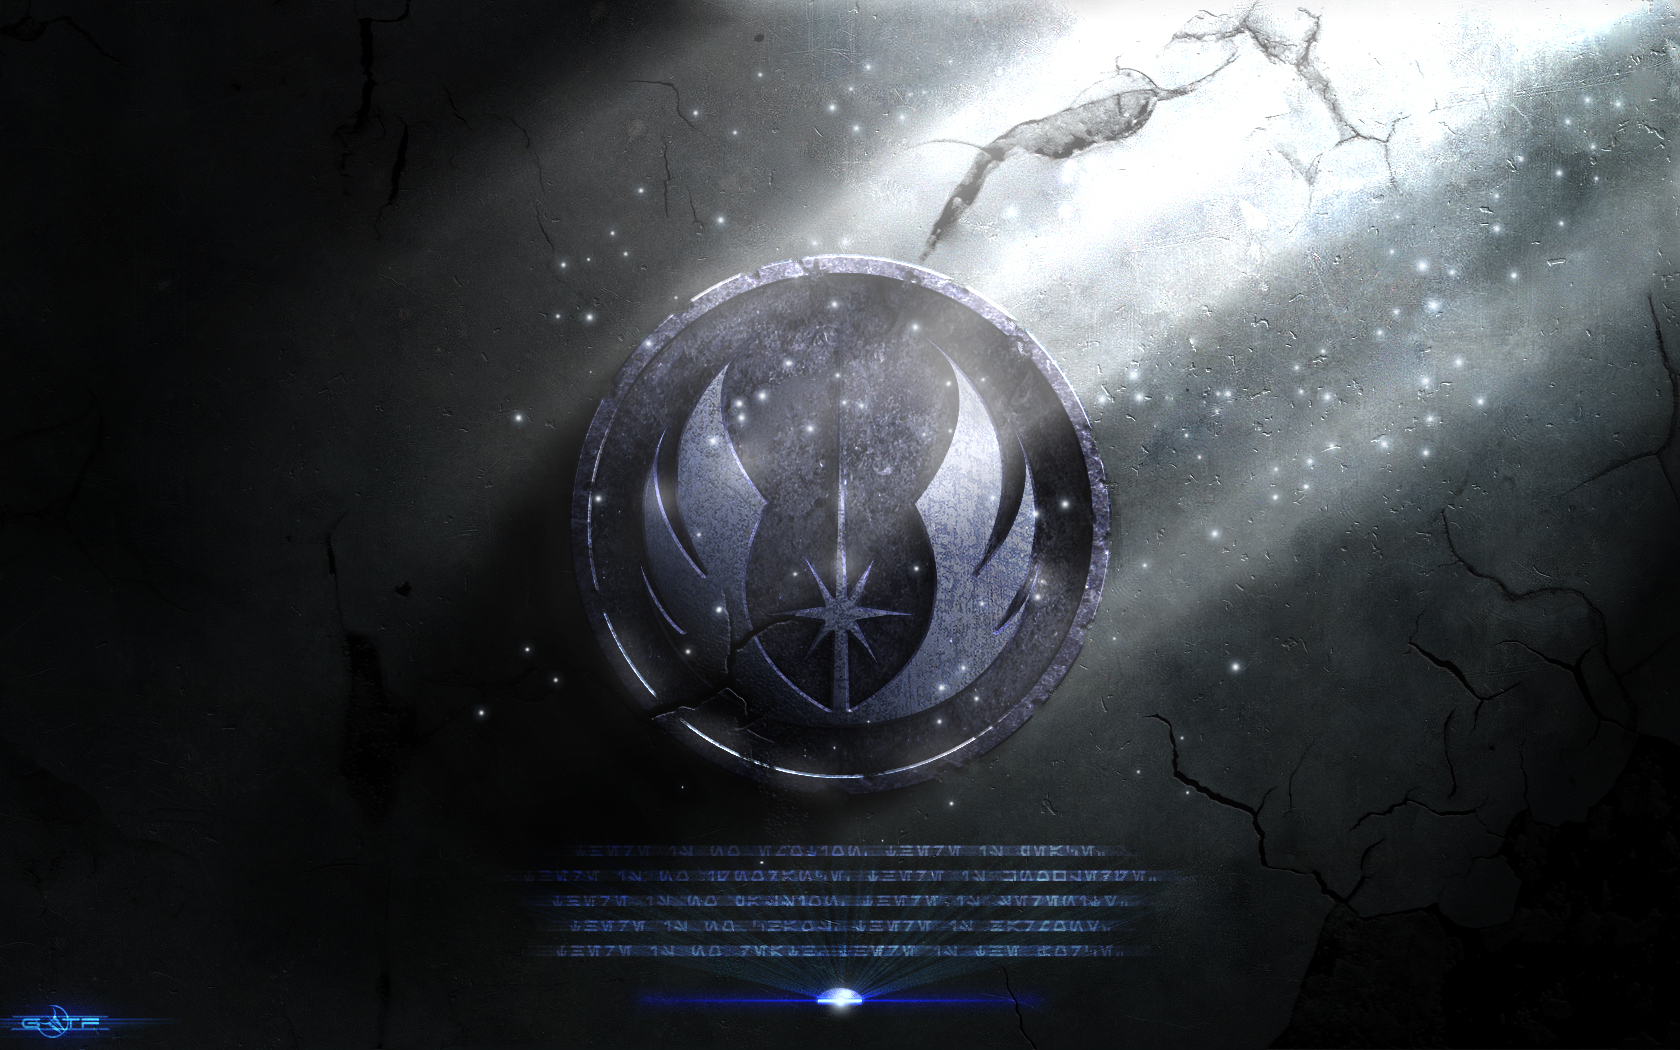 Jedi Logo Wallpaper Hd This was my desktop for 1680x1050